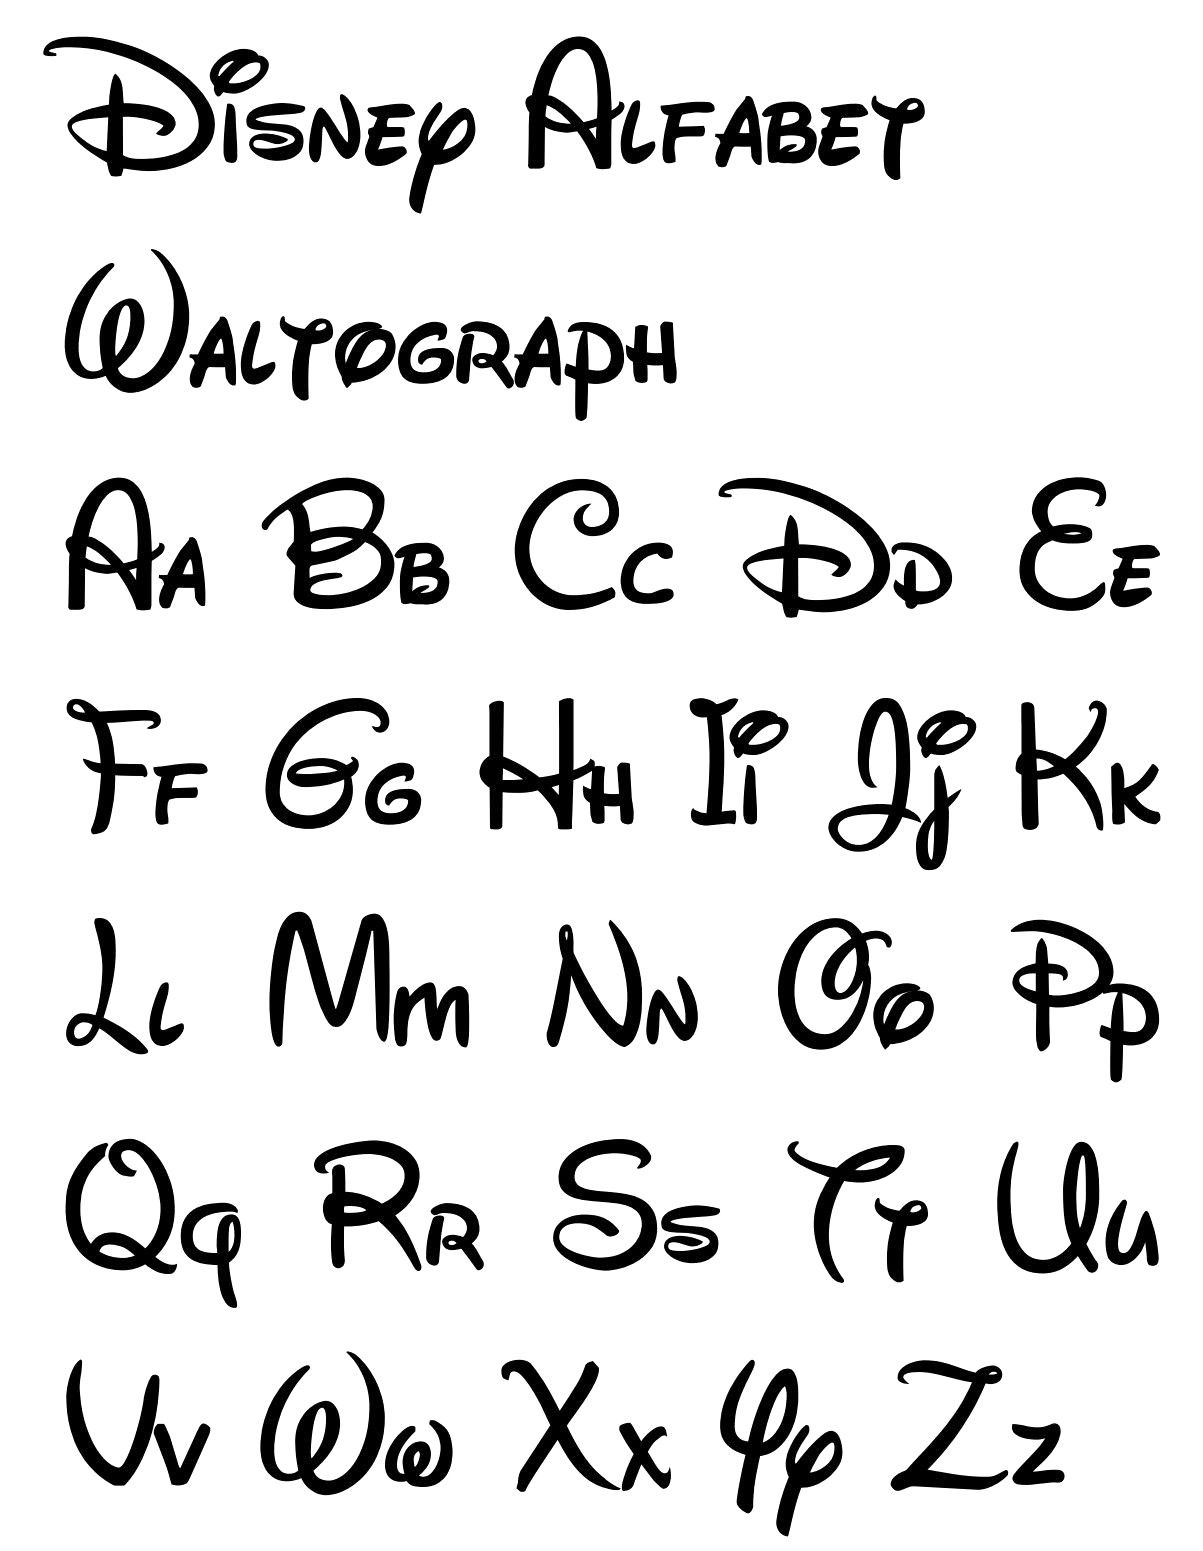 Free Printable Disney Letter Stencils | Disney | Pinterest - Free Printable Disney Font Stencils